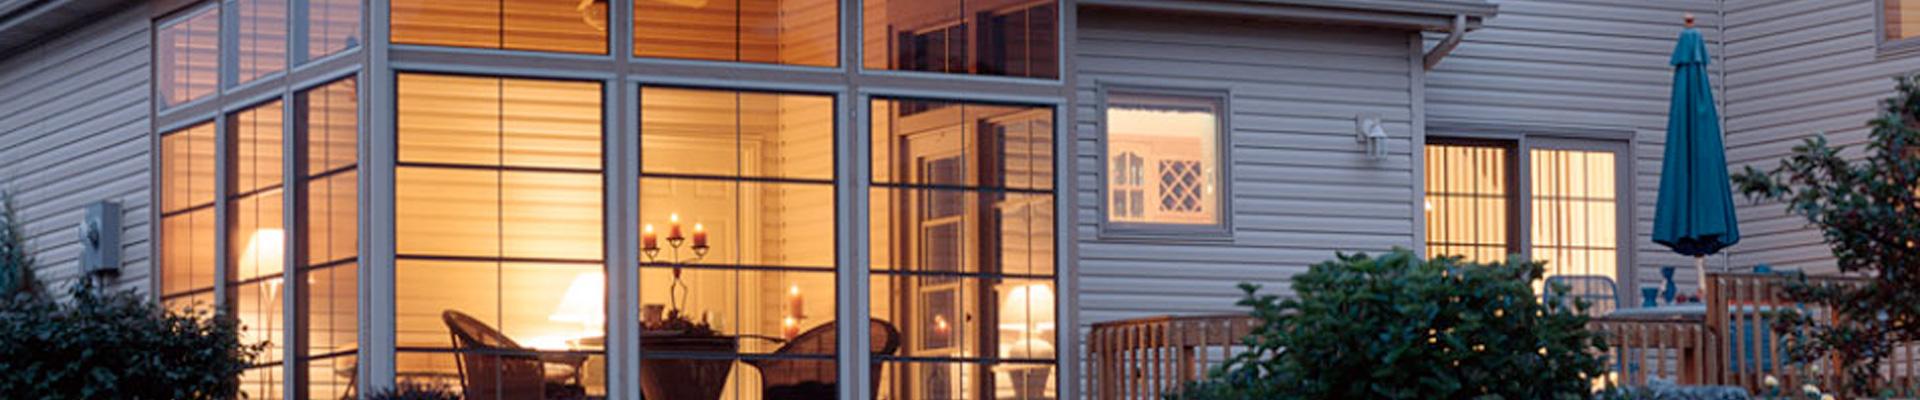 easy breeze windows plastic eze breeze windows fun outdoor living